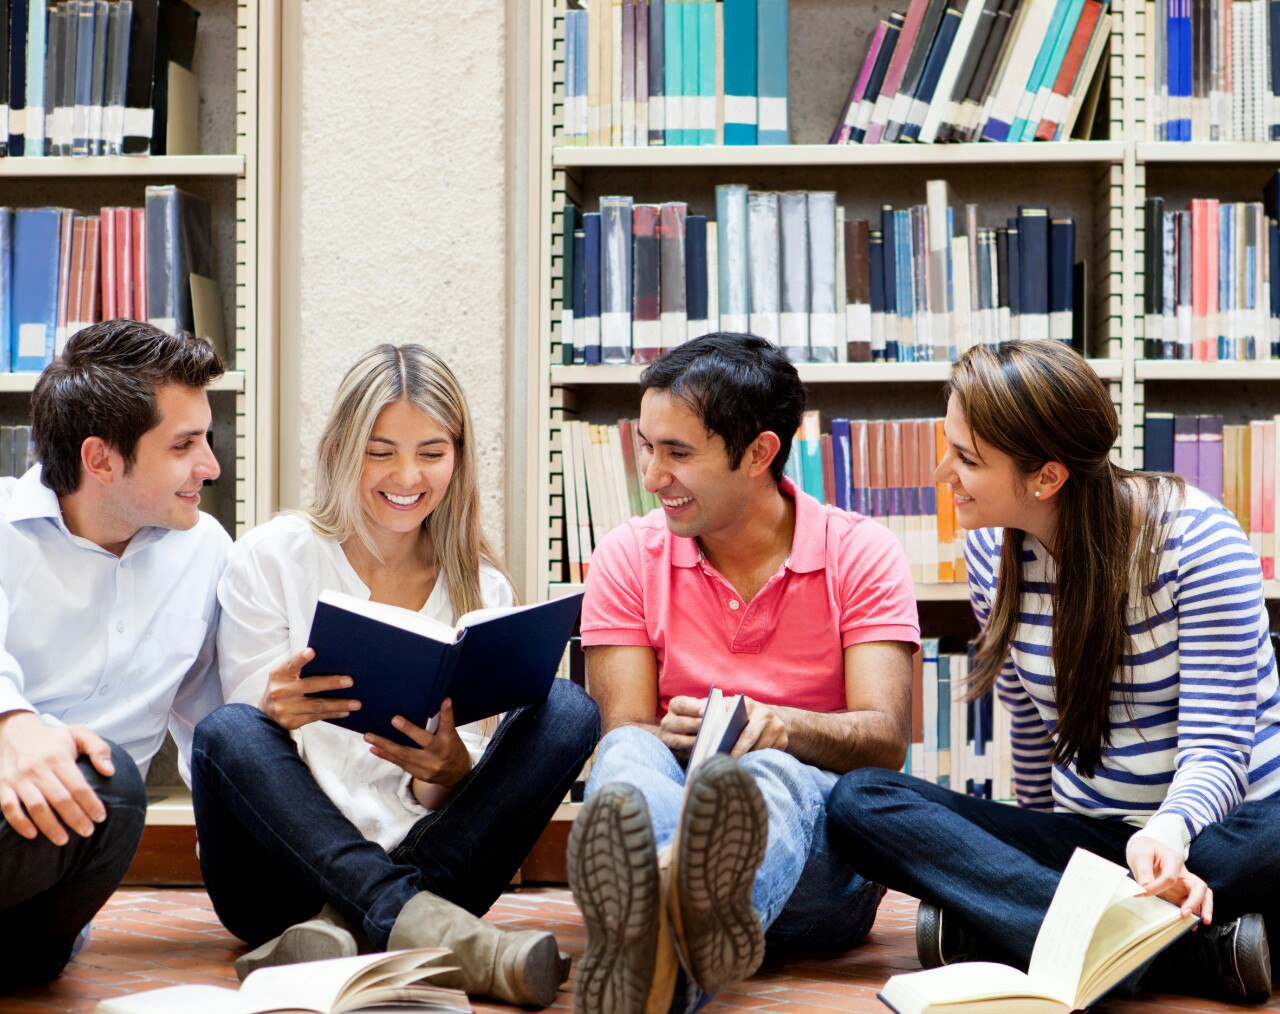 english essays for high school students Essay For High School Students